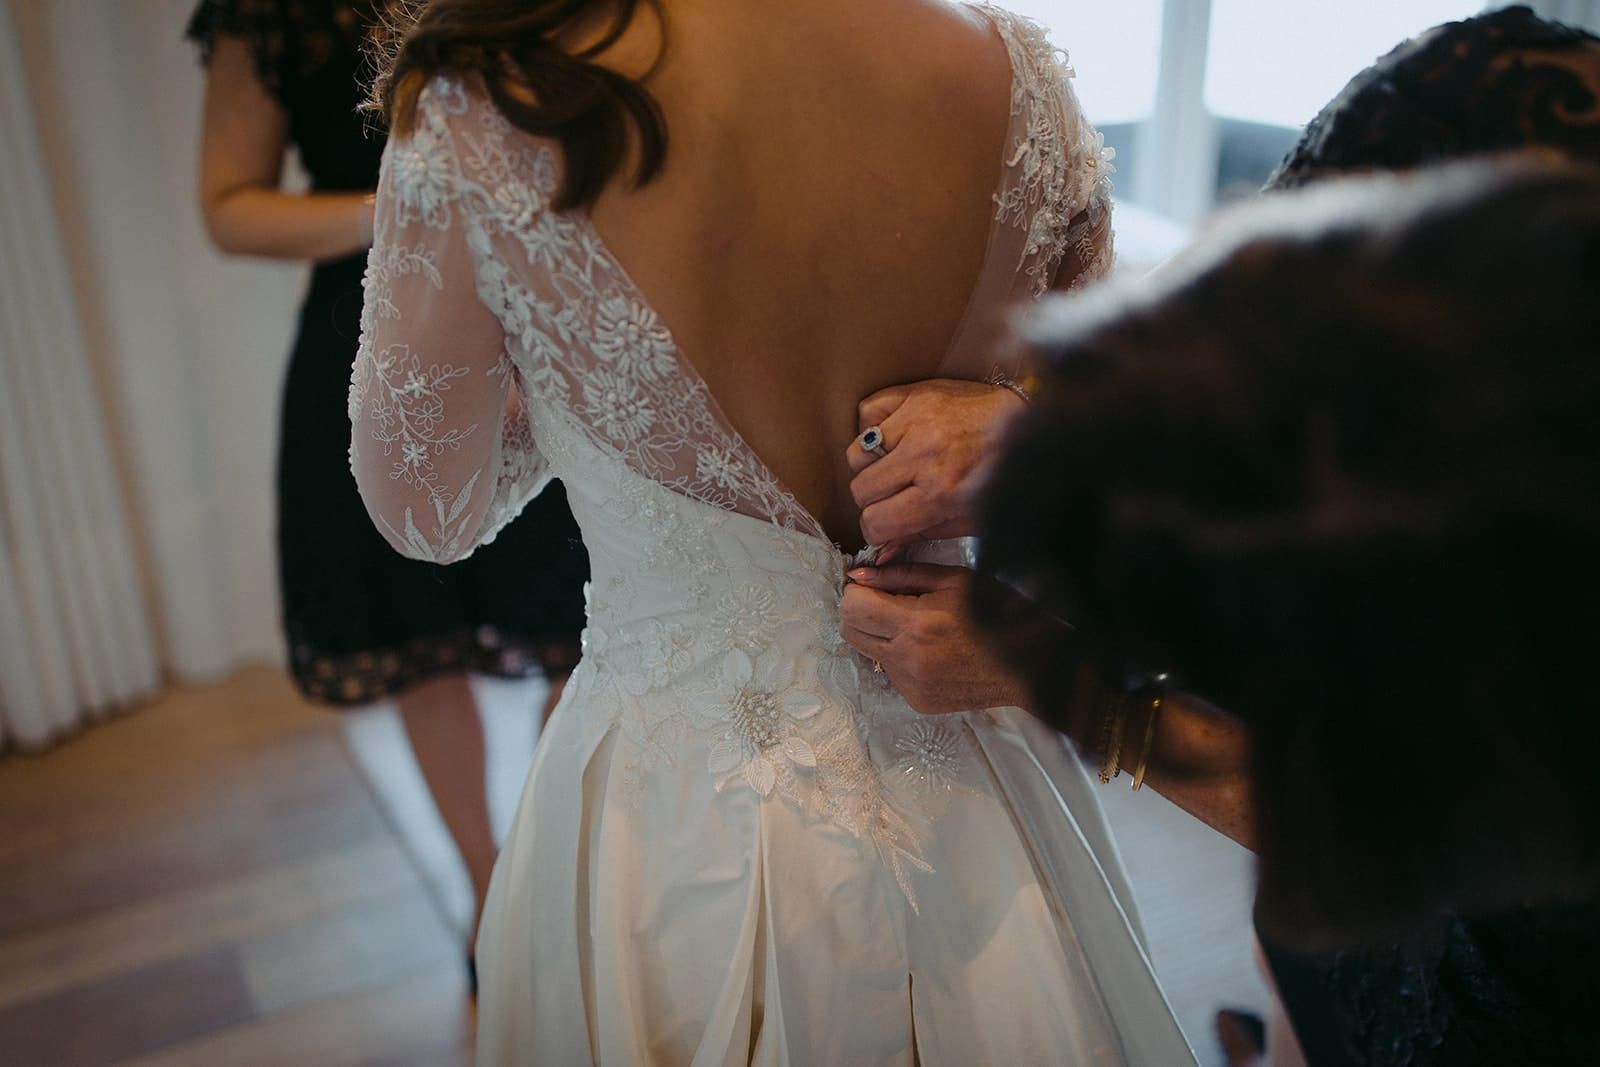 Real Weddings | Vinka Design | Real Brides Wearing Vinka Gowns | Sara and Ben -Sara having low v back of bespoke gown fastened